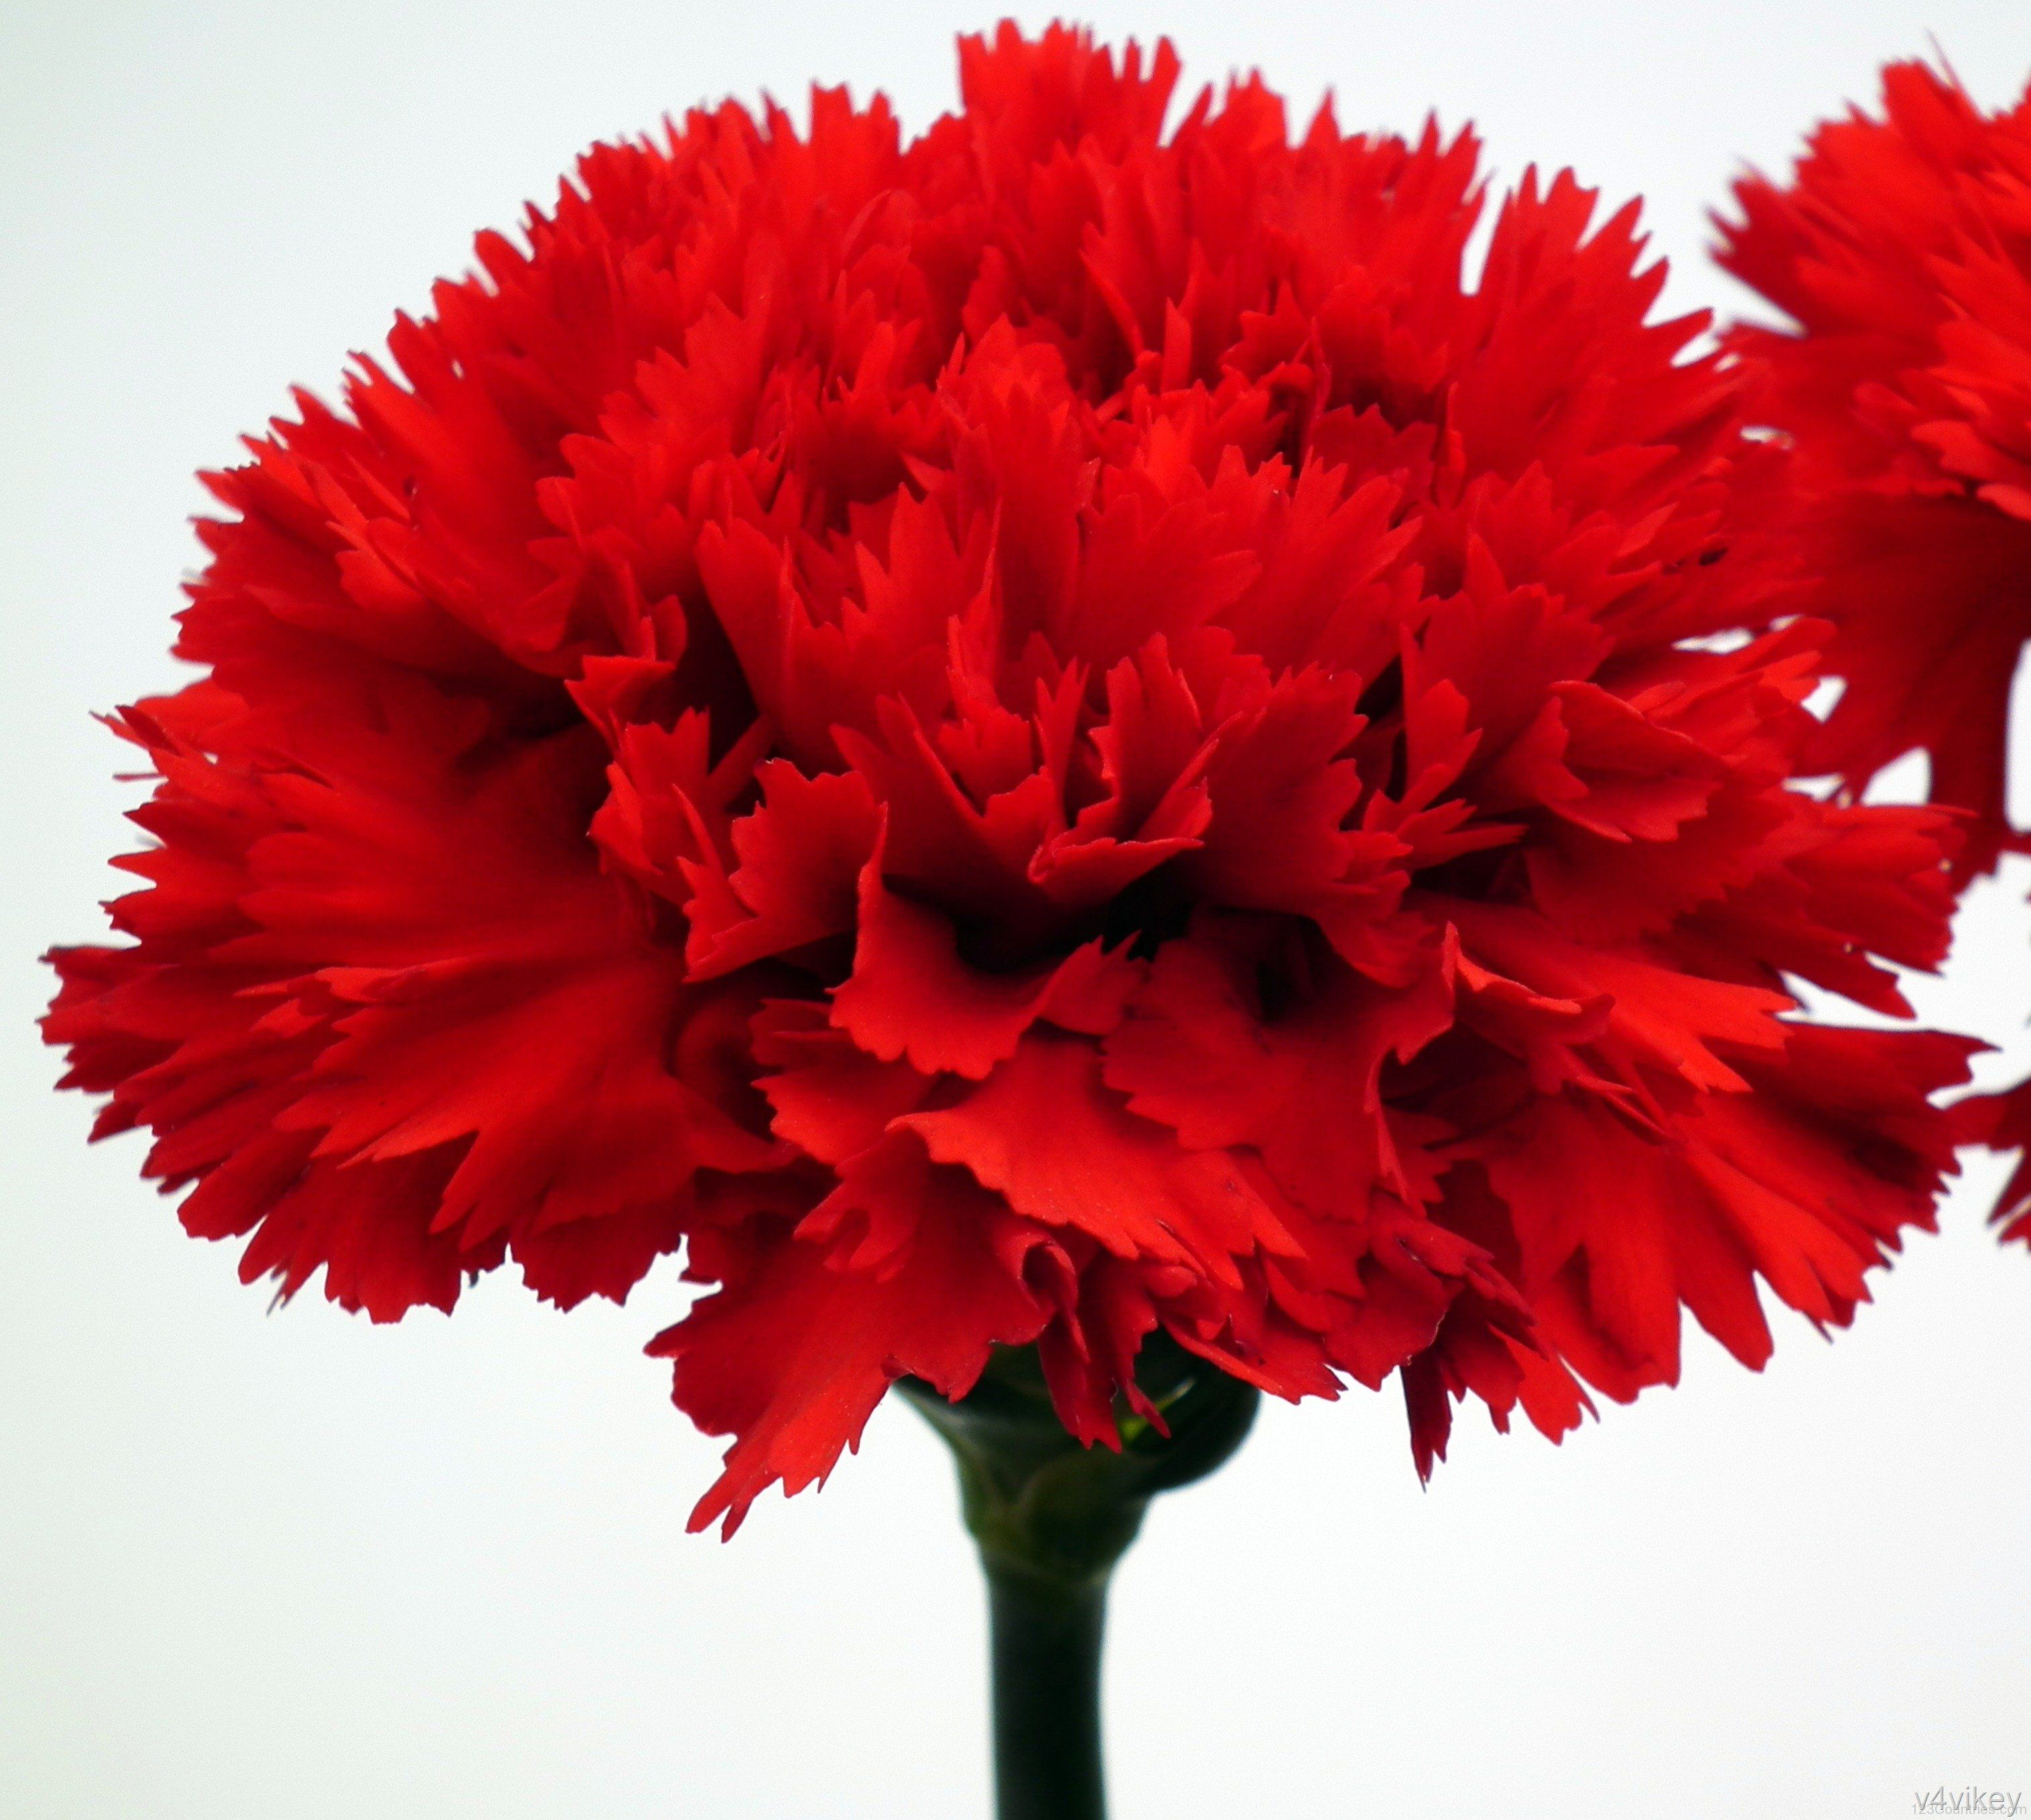 Http Www 123countries Com Wp Content Uploads 2015 06 Red Carnation Flower Jpg Flower Seeds Online Carnation Flower Flower Seeds